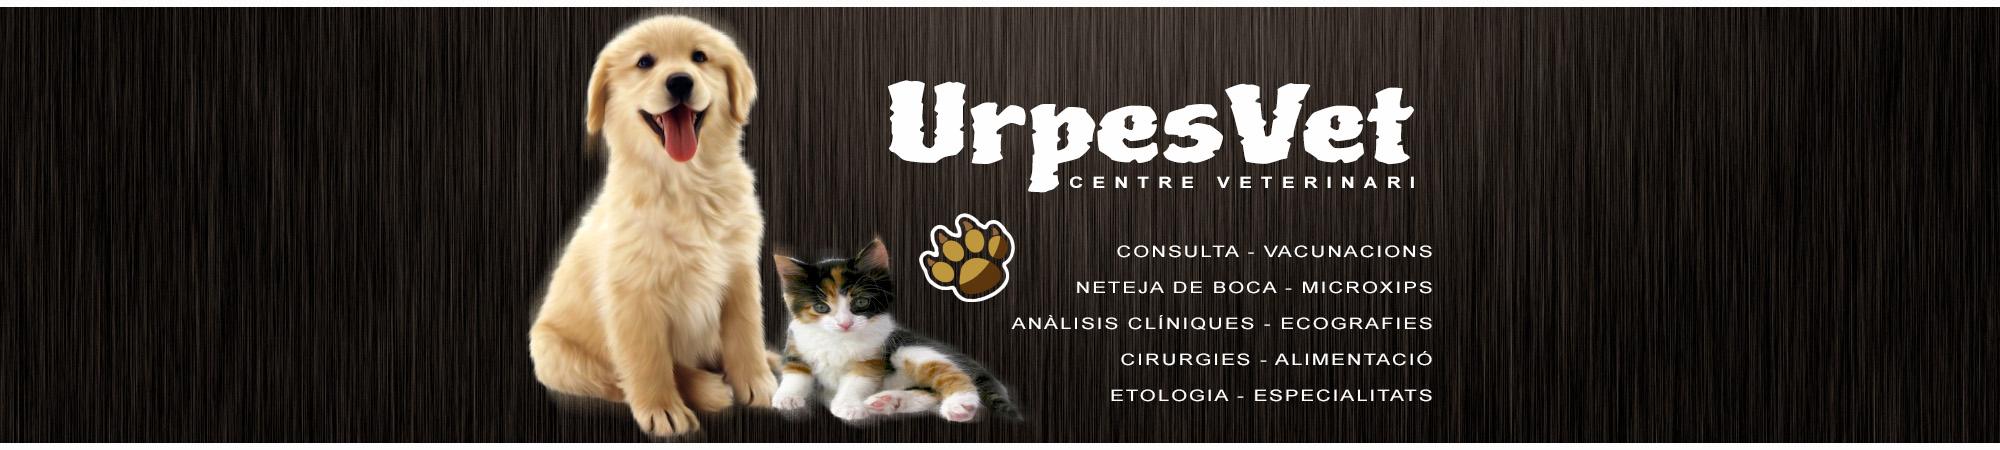 Centro servicio veterinario Baix Llobregat, Centro veterinario veterinari Sant Joan Despí